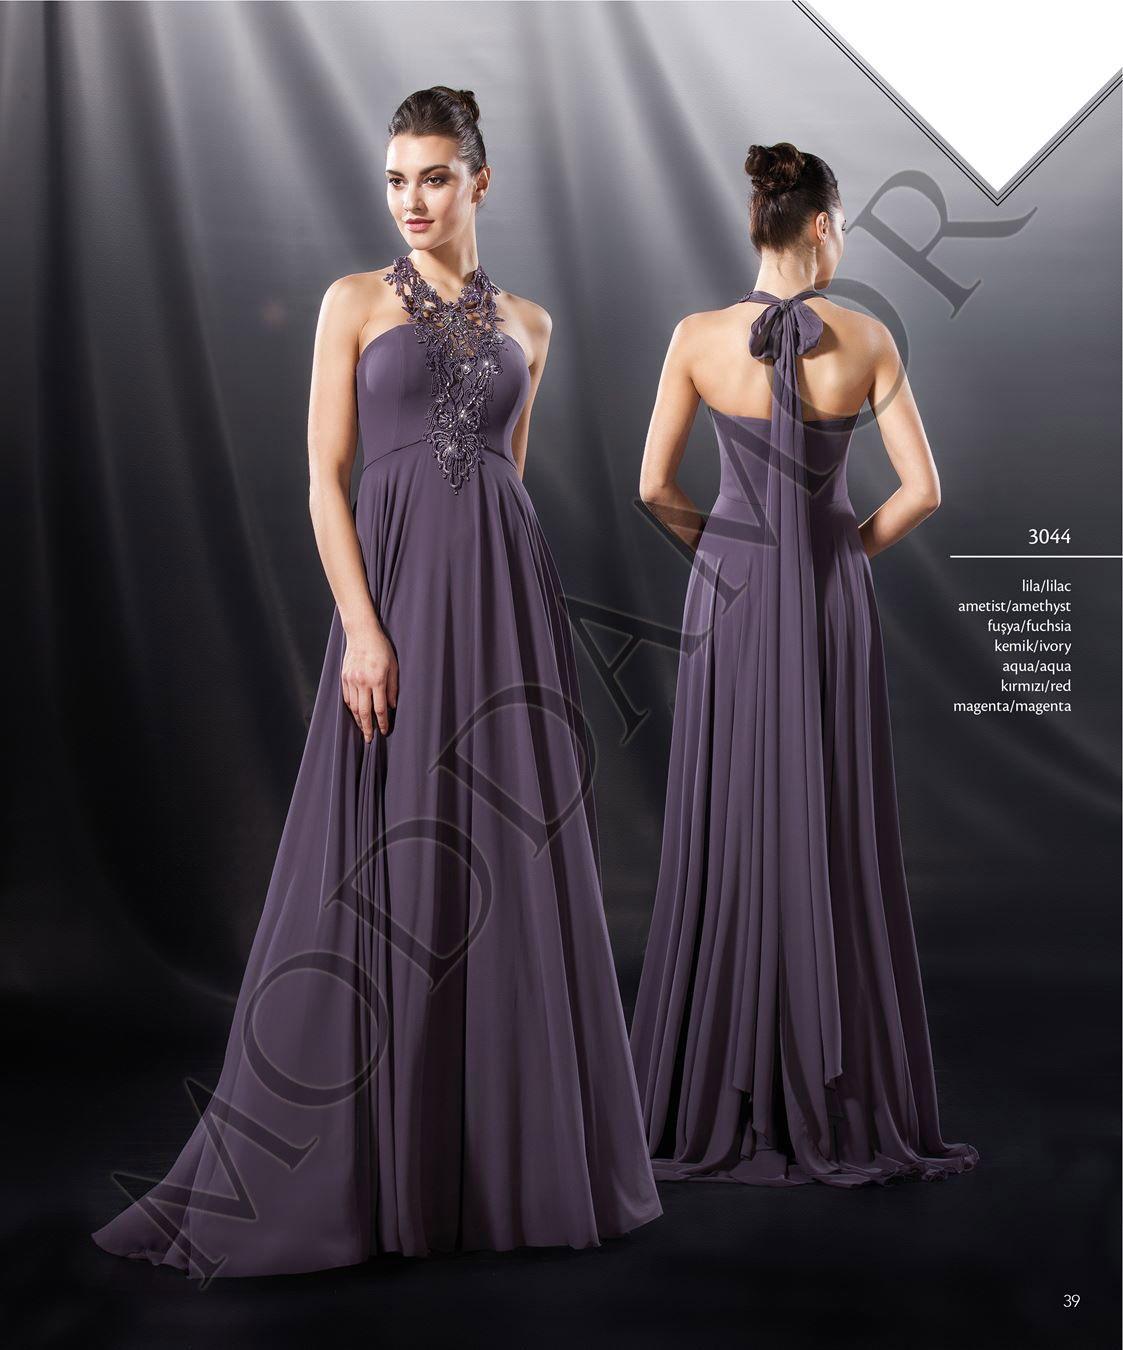 Lujo Vestidos De Novia En Denver Motivo - Vestido de Novia Para Las ...